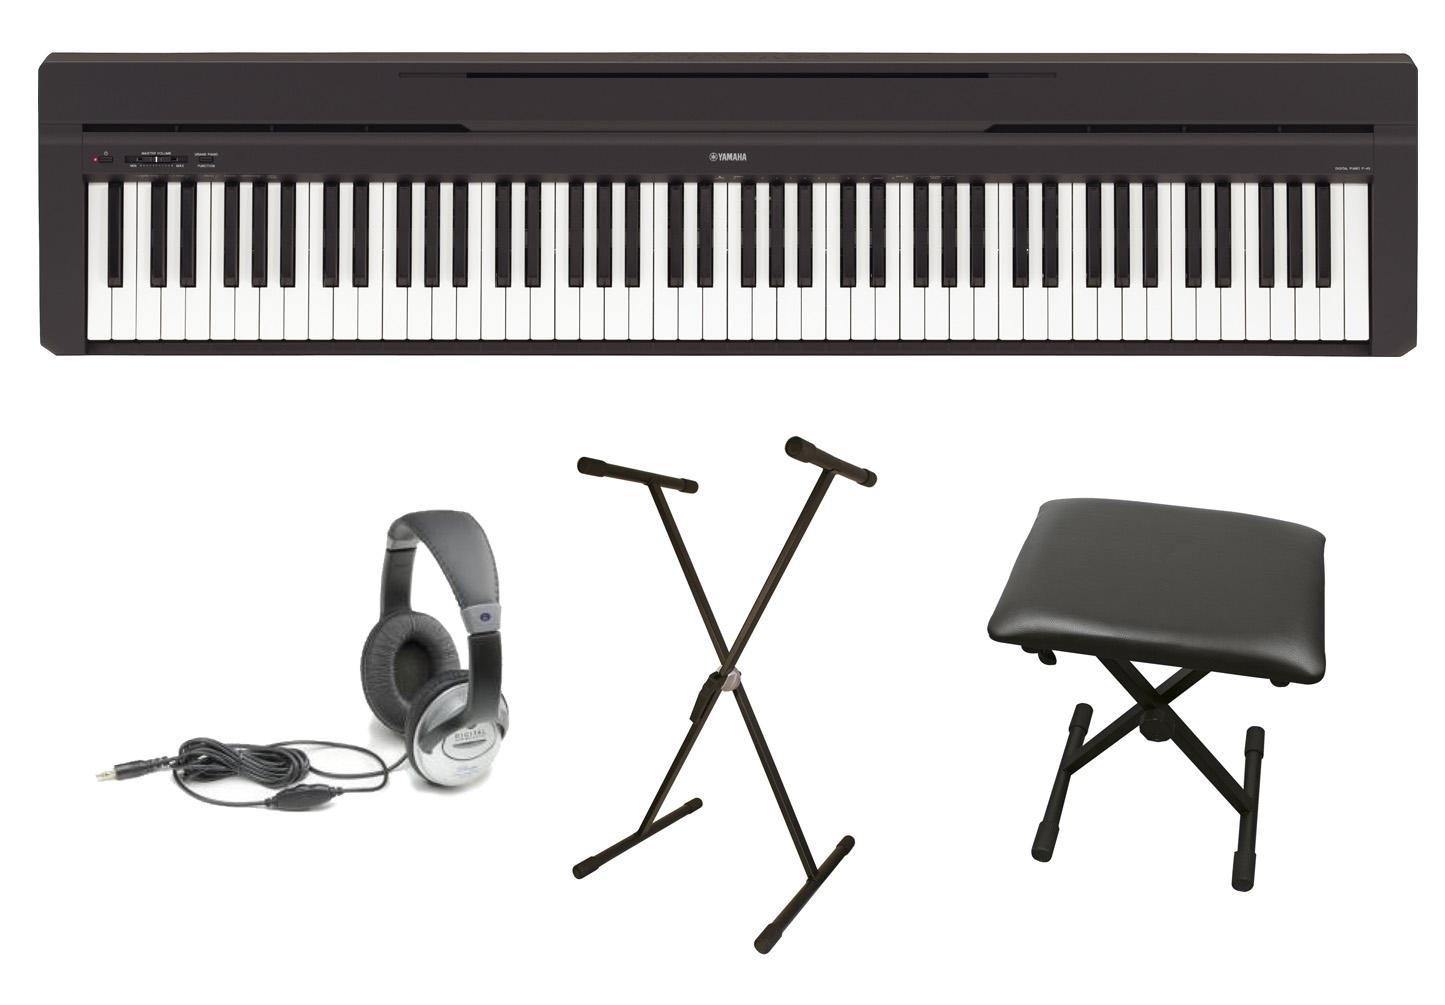 Yamaha P-45 Portable Piano Pack With P-45 Piano ...